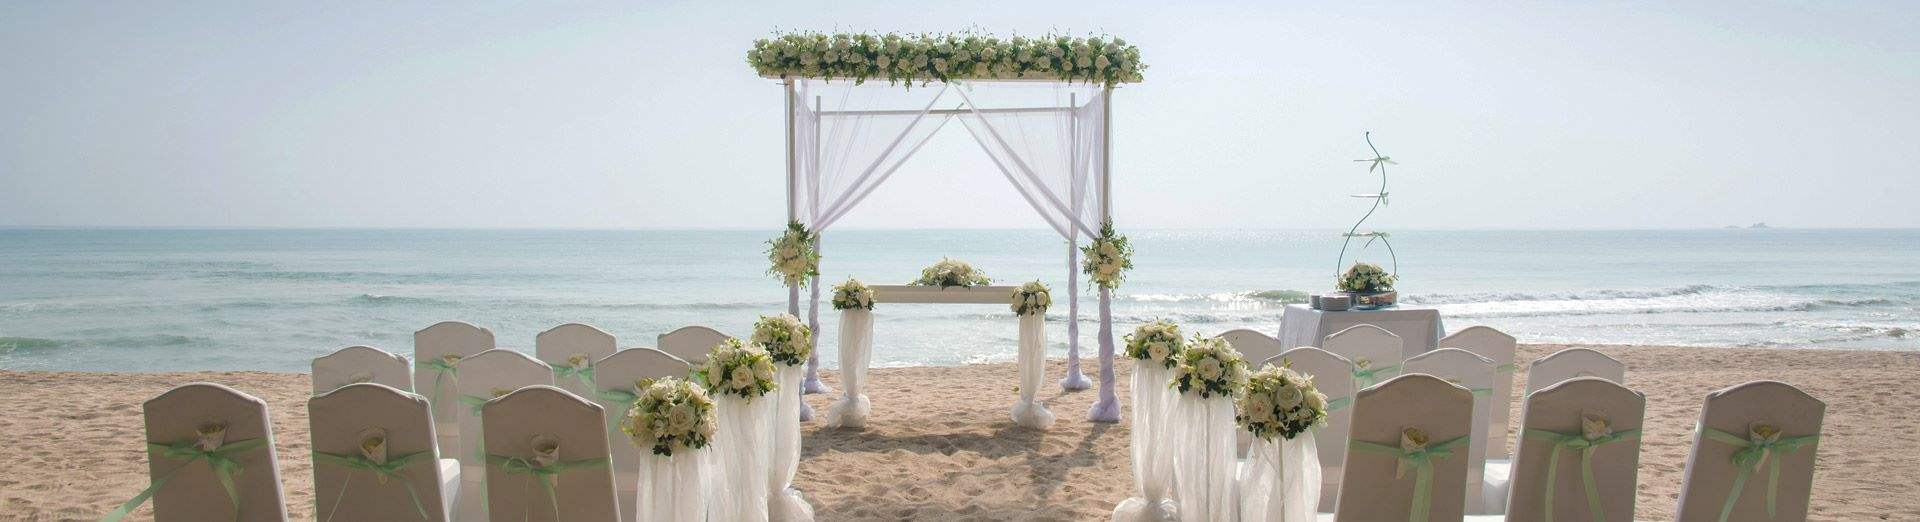 Beach Weddings At Holiday Inn Oceanfront At Surfside Beach South Carolina